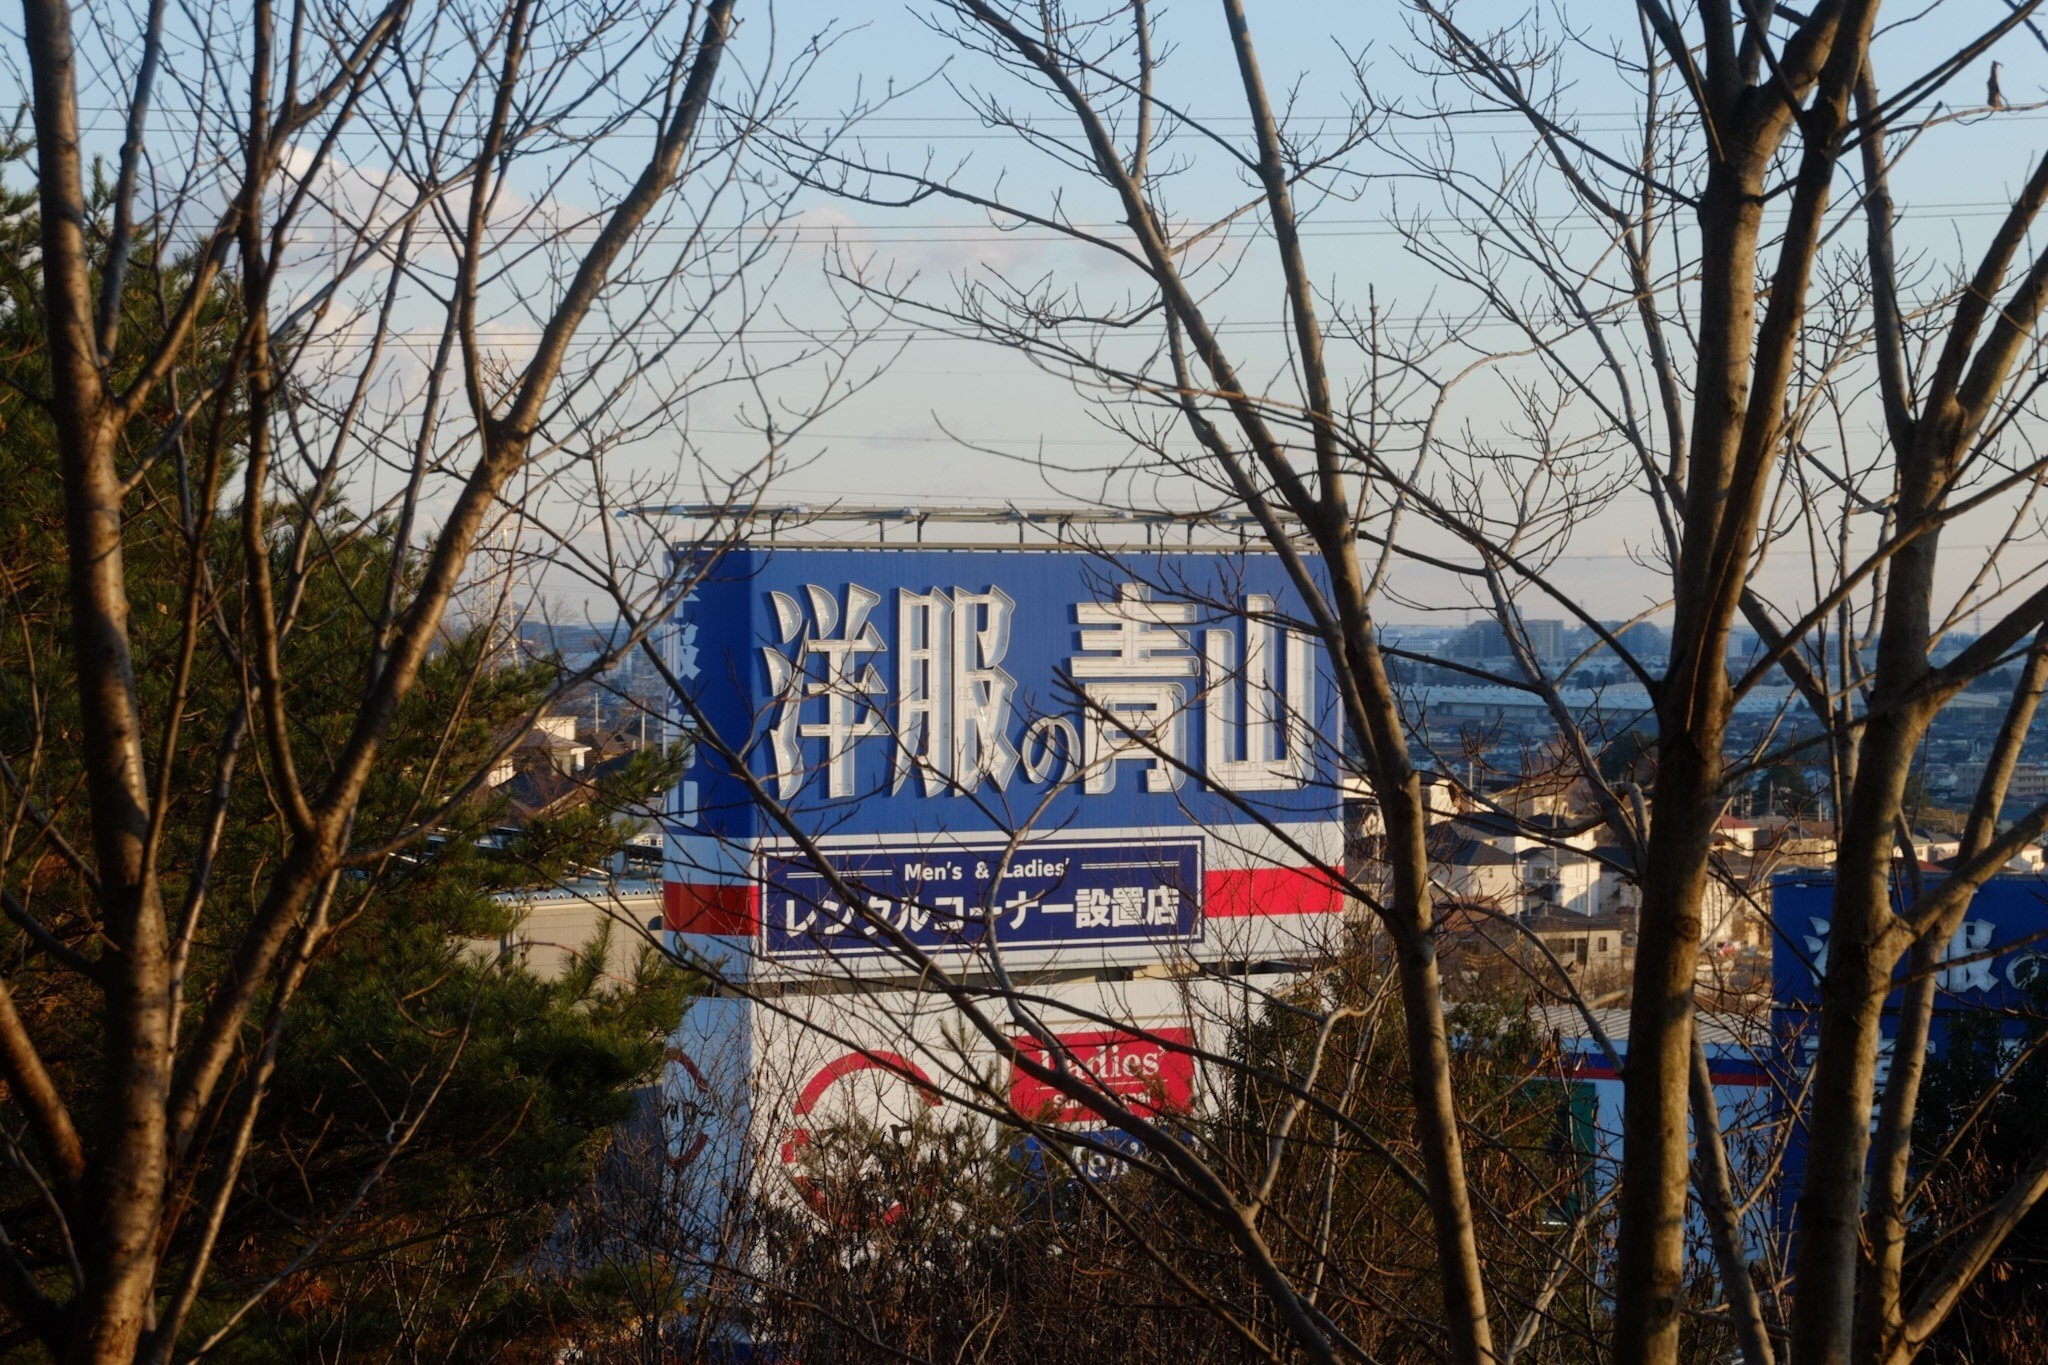 f:id:Yamadamado:20210118014844j:image